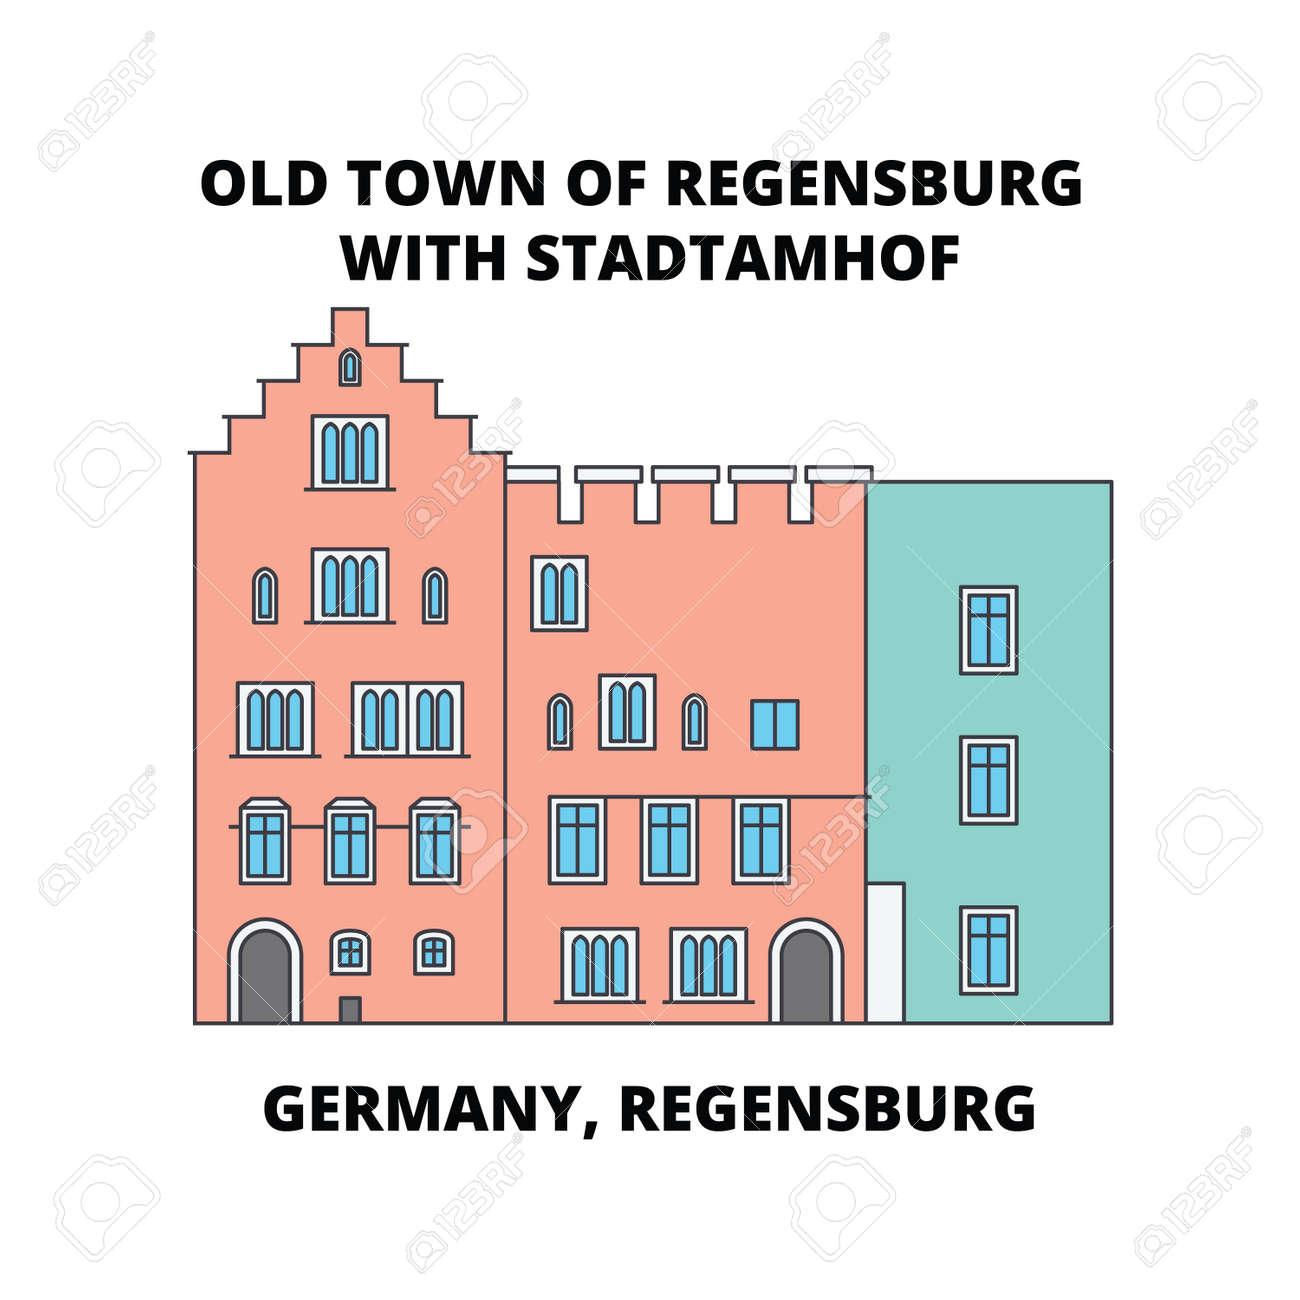 Germany, Regensburg, Old Town Stadtamhof line icon, vector illustration. Germany, Regensburg, Old Town Stadtamhof flat concept sign. - 102463294